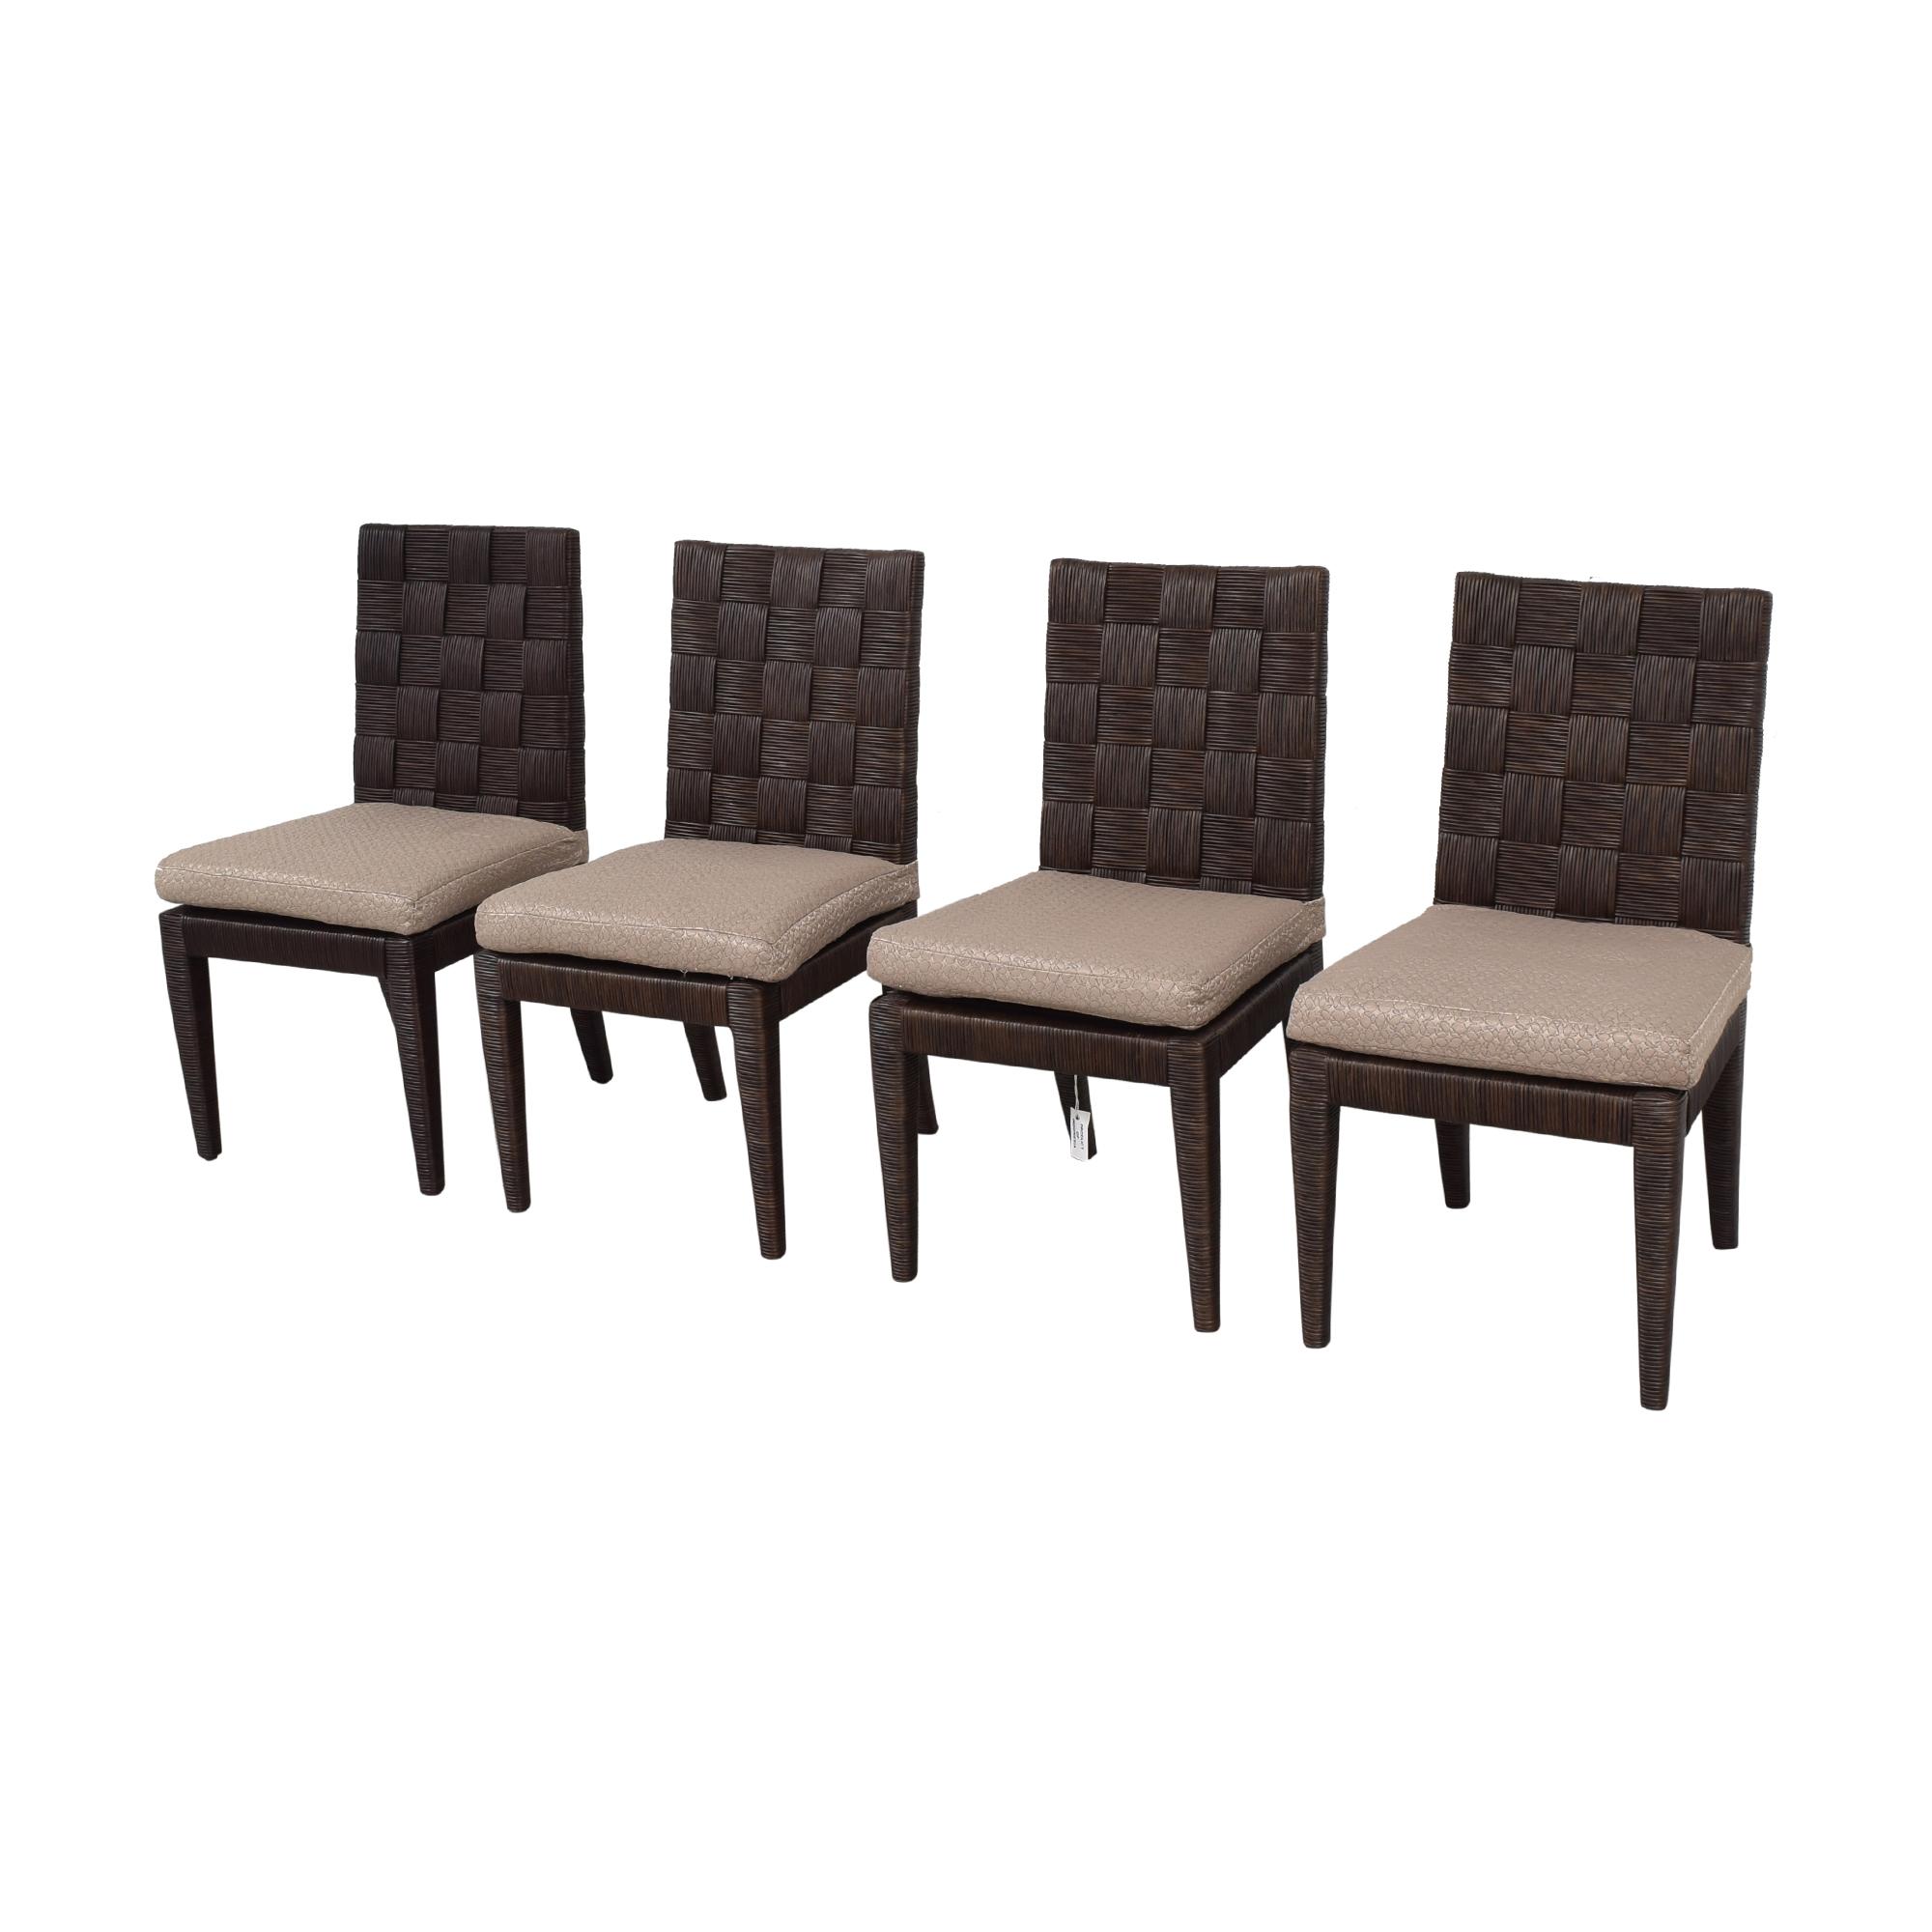 shop Donghia John Hutton Block Island Side Dining Chairs Donghia Chairs